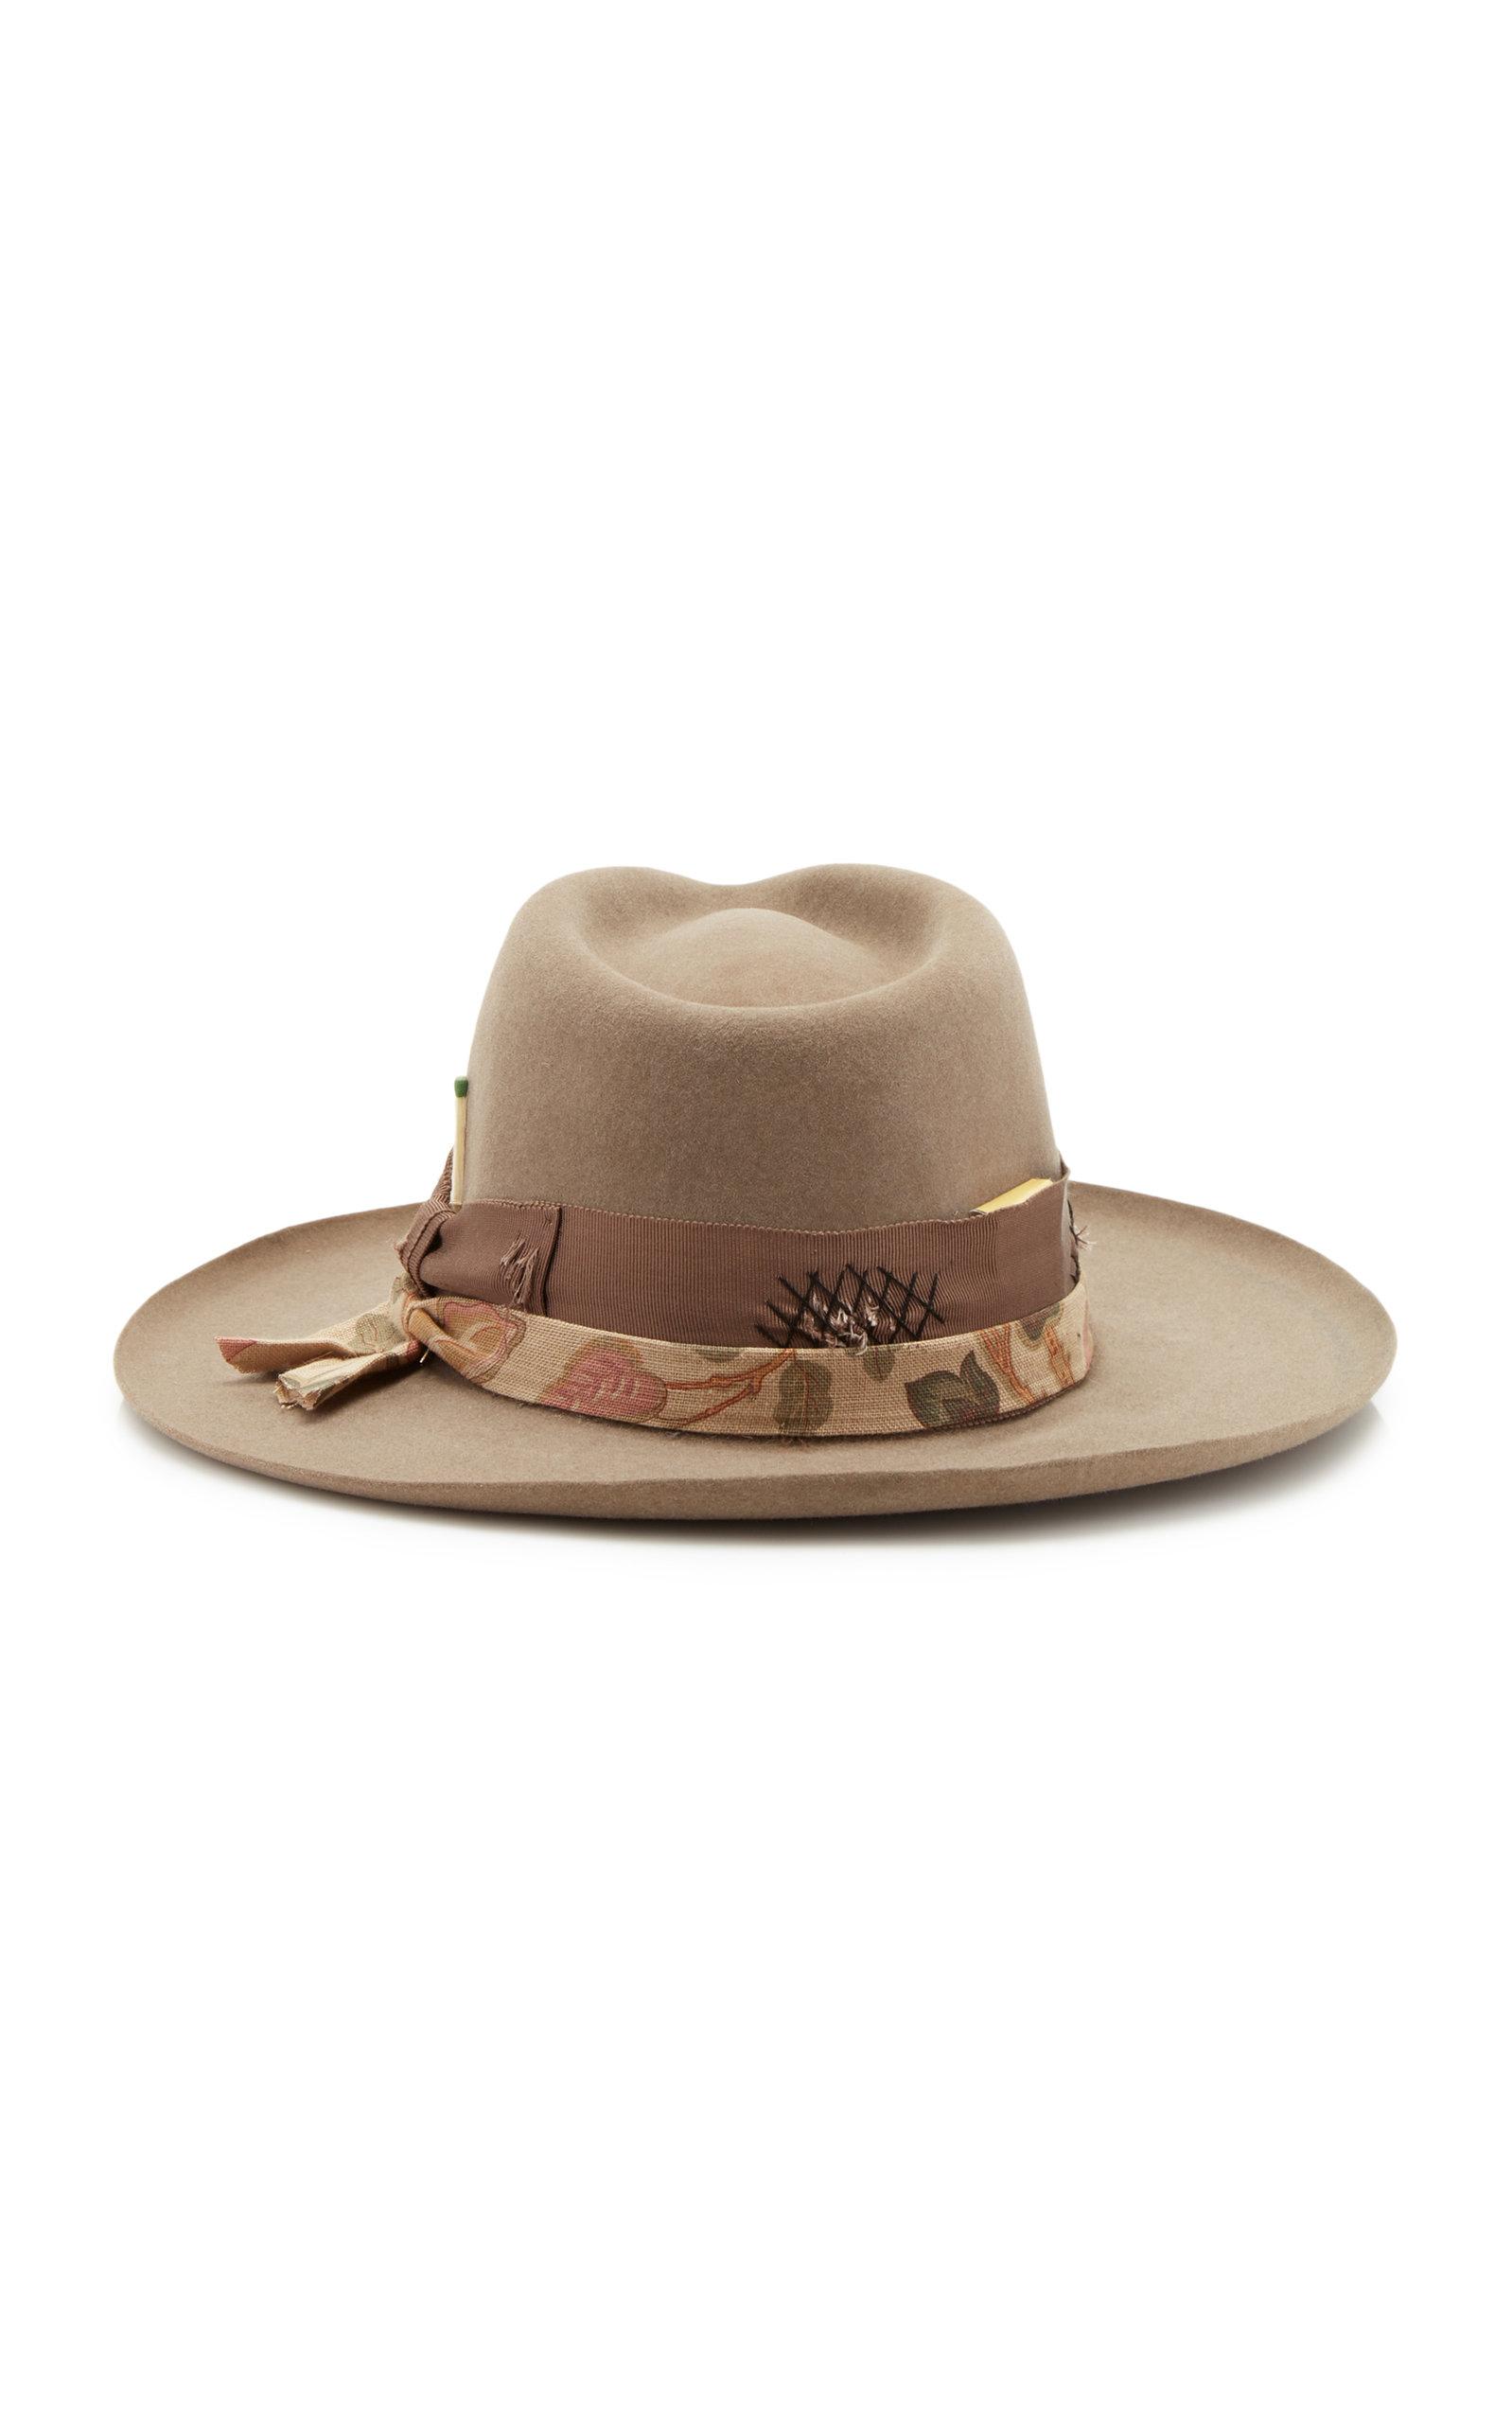 Astral Beaver Felt Smoke Hat Nick Fouquet KeFBa